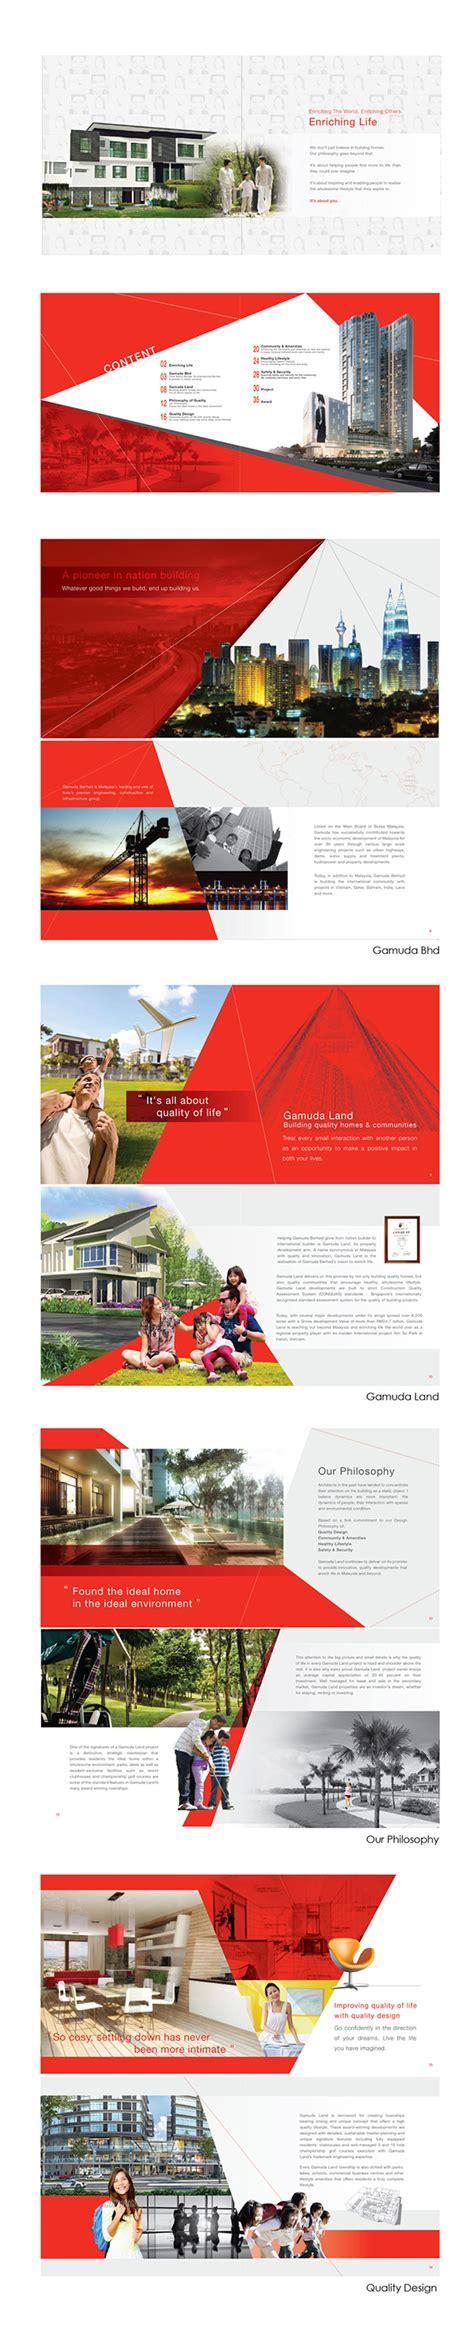 land layout brochure gamuda land company profile on behance pinteres